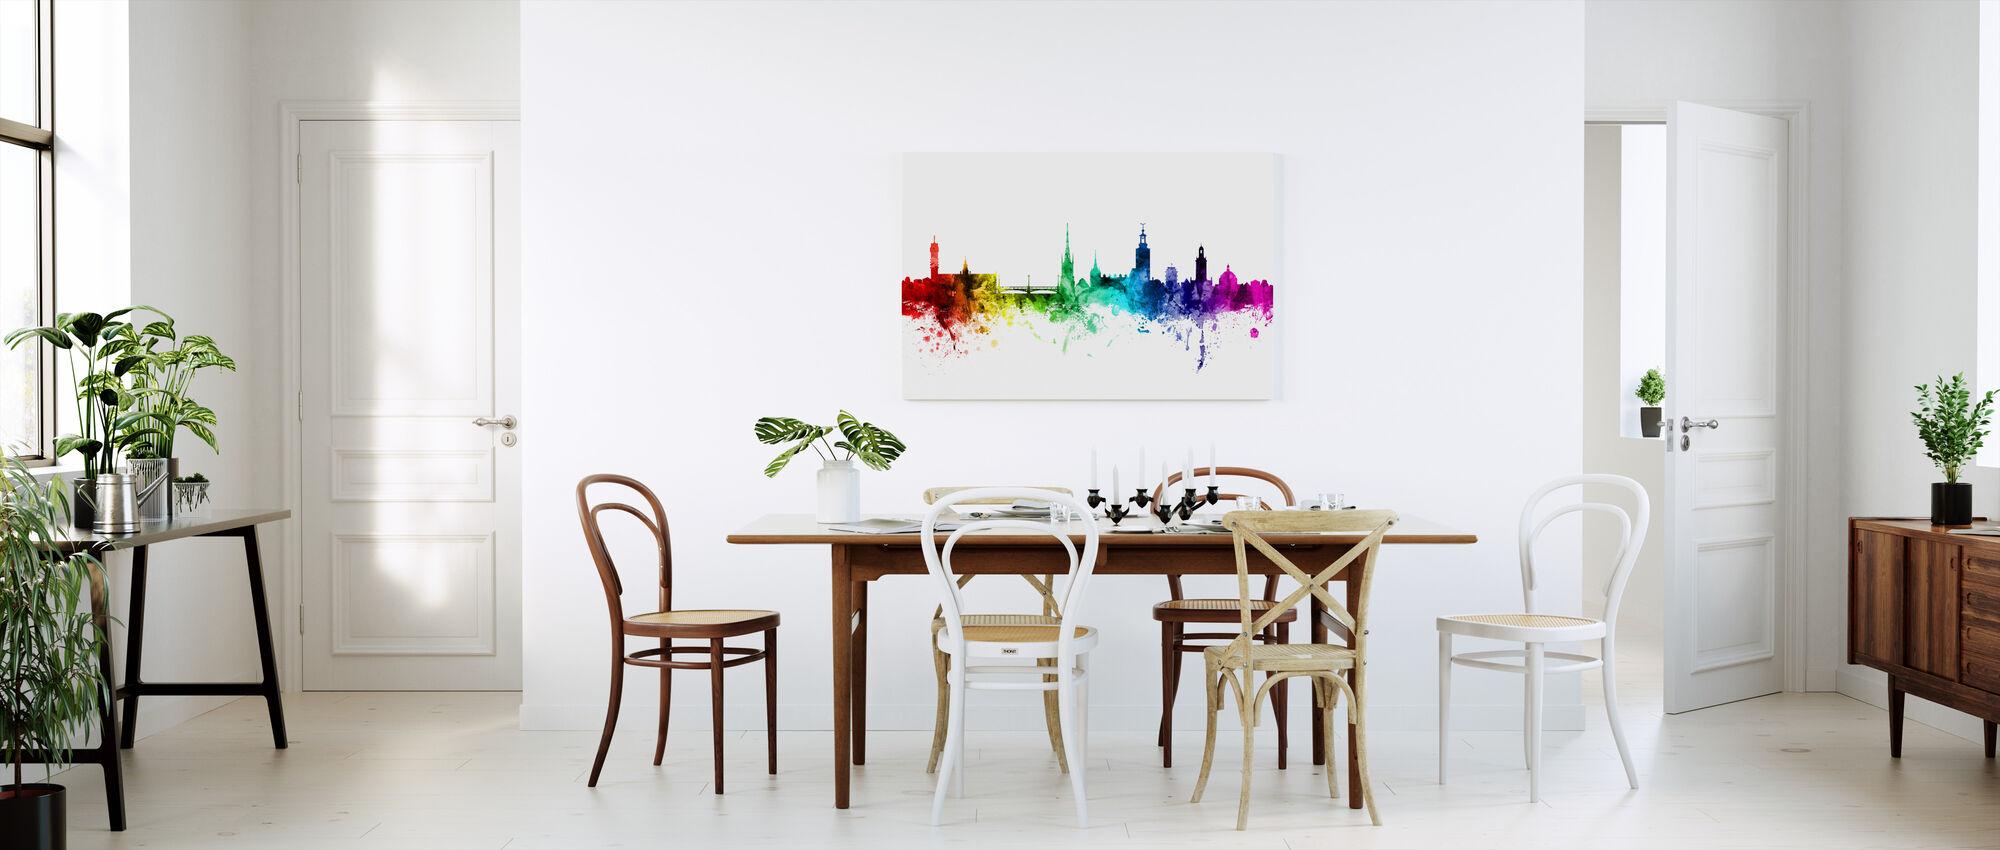 Stockholm Skyline Rainbow - Canvastavla - Kök